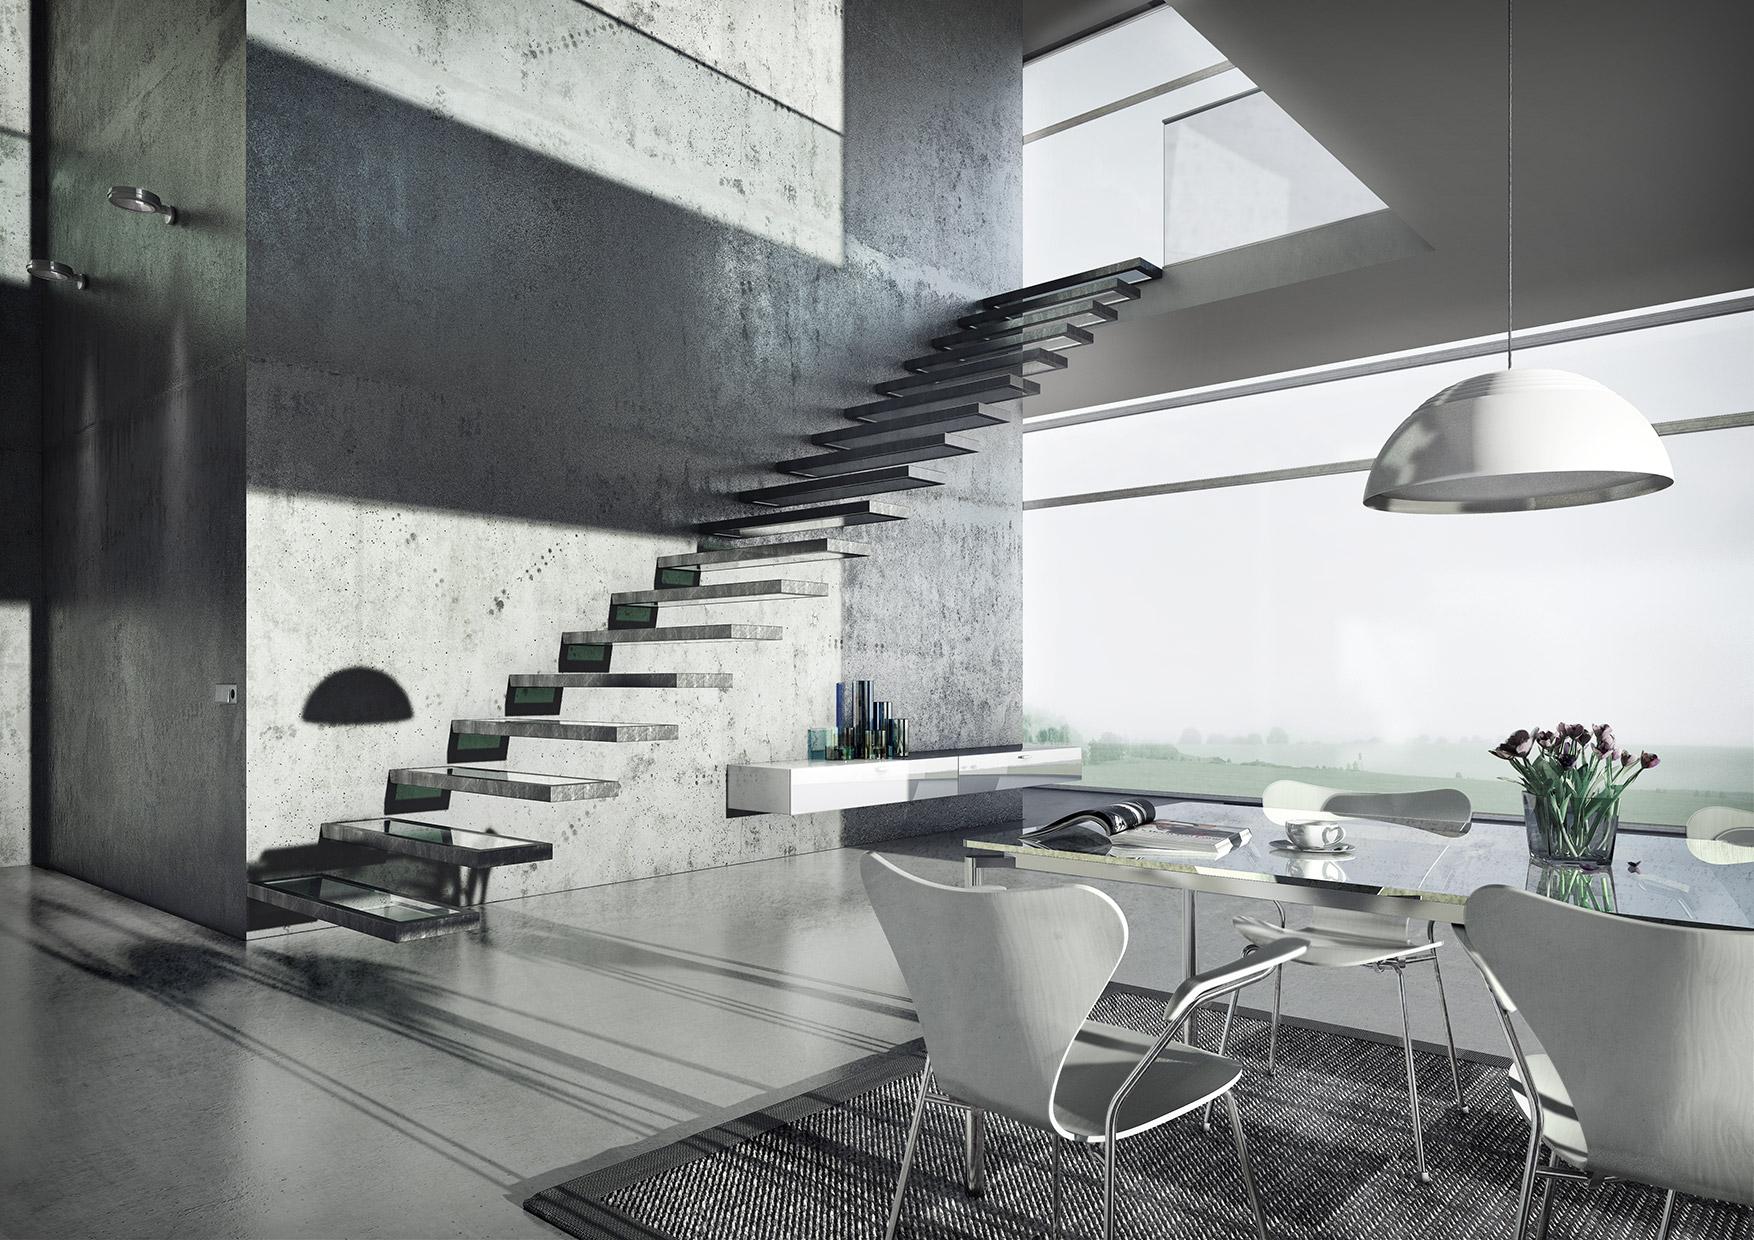 CGI Rendering 3d Beton Concrete Apartment Interior Wohnraum Idris Kolodziej